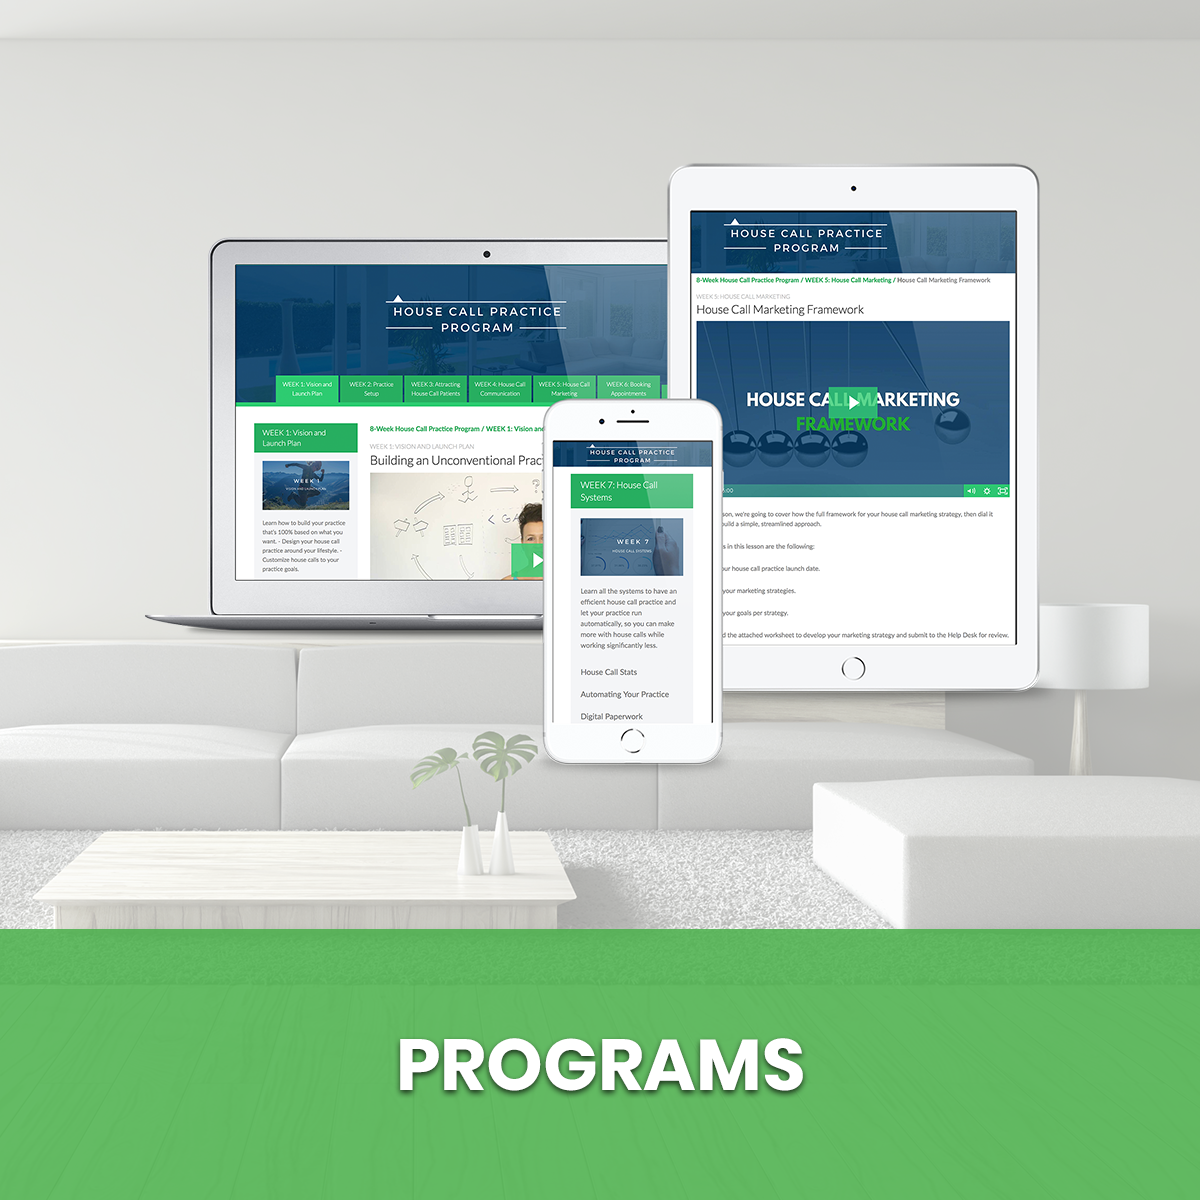 Programs - Green